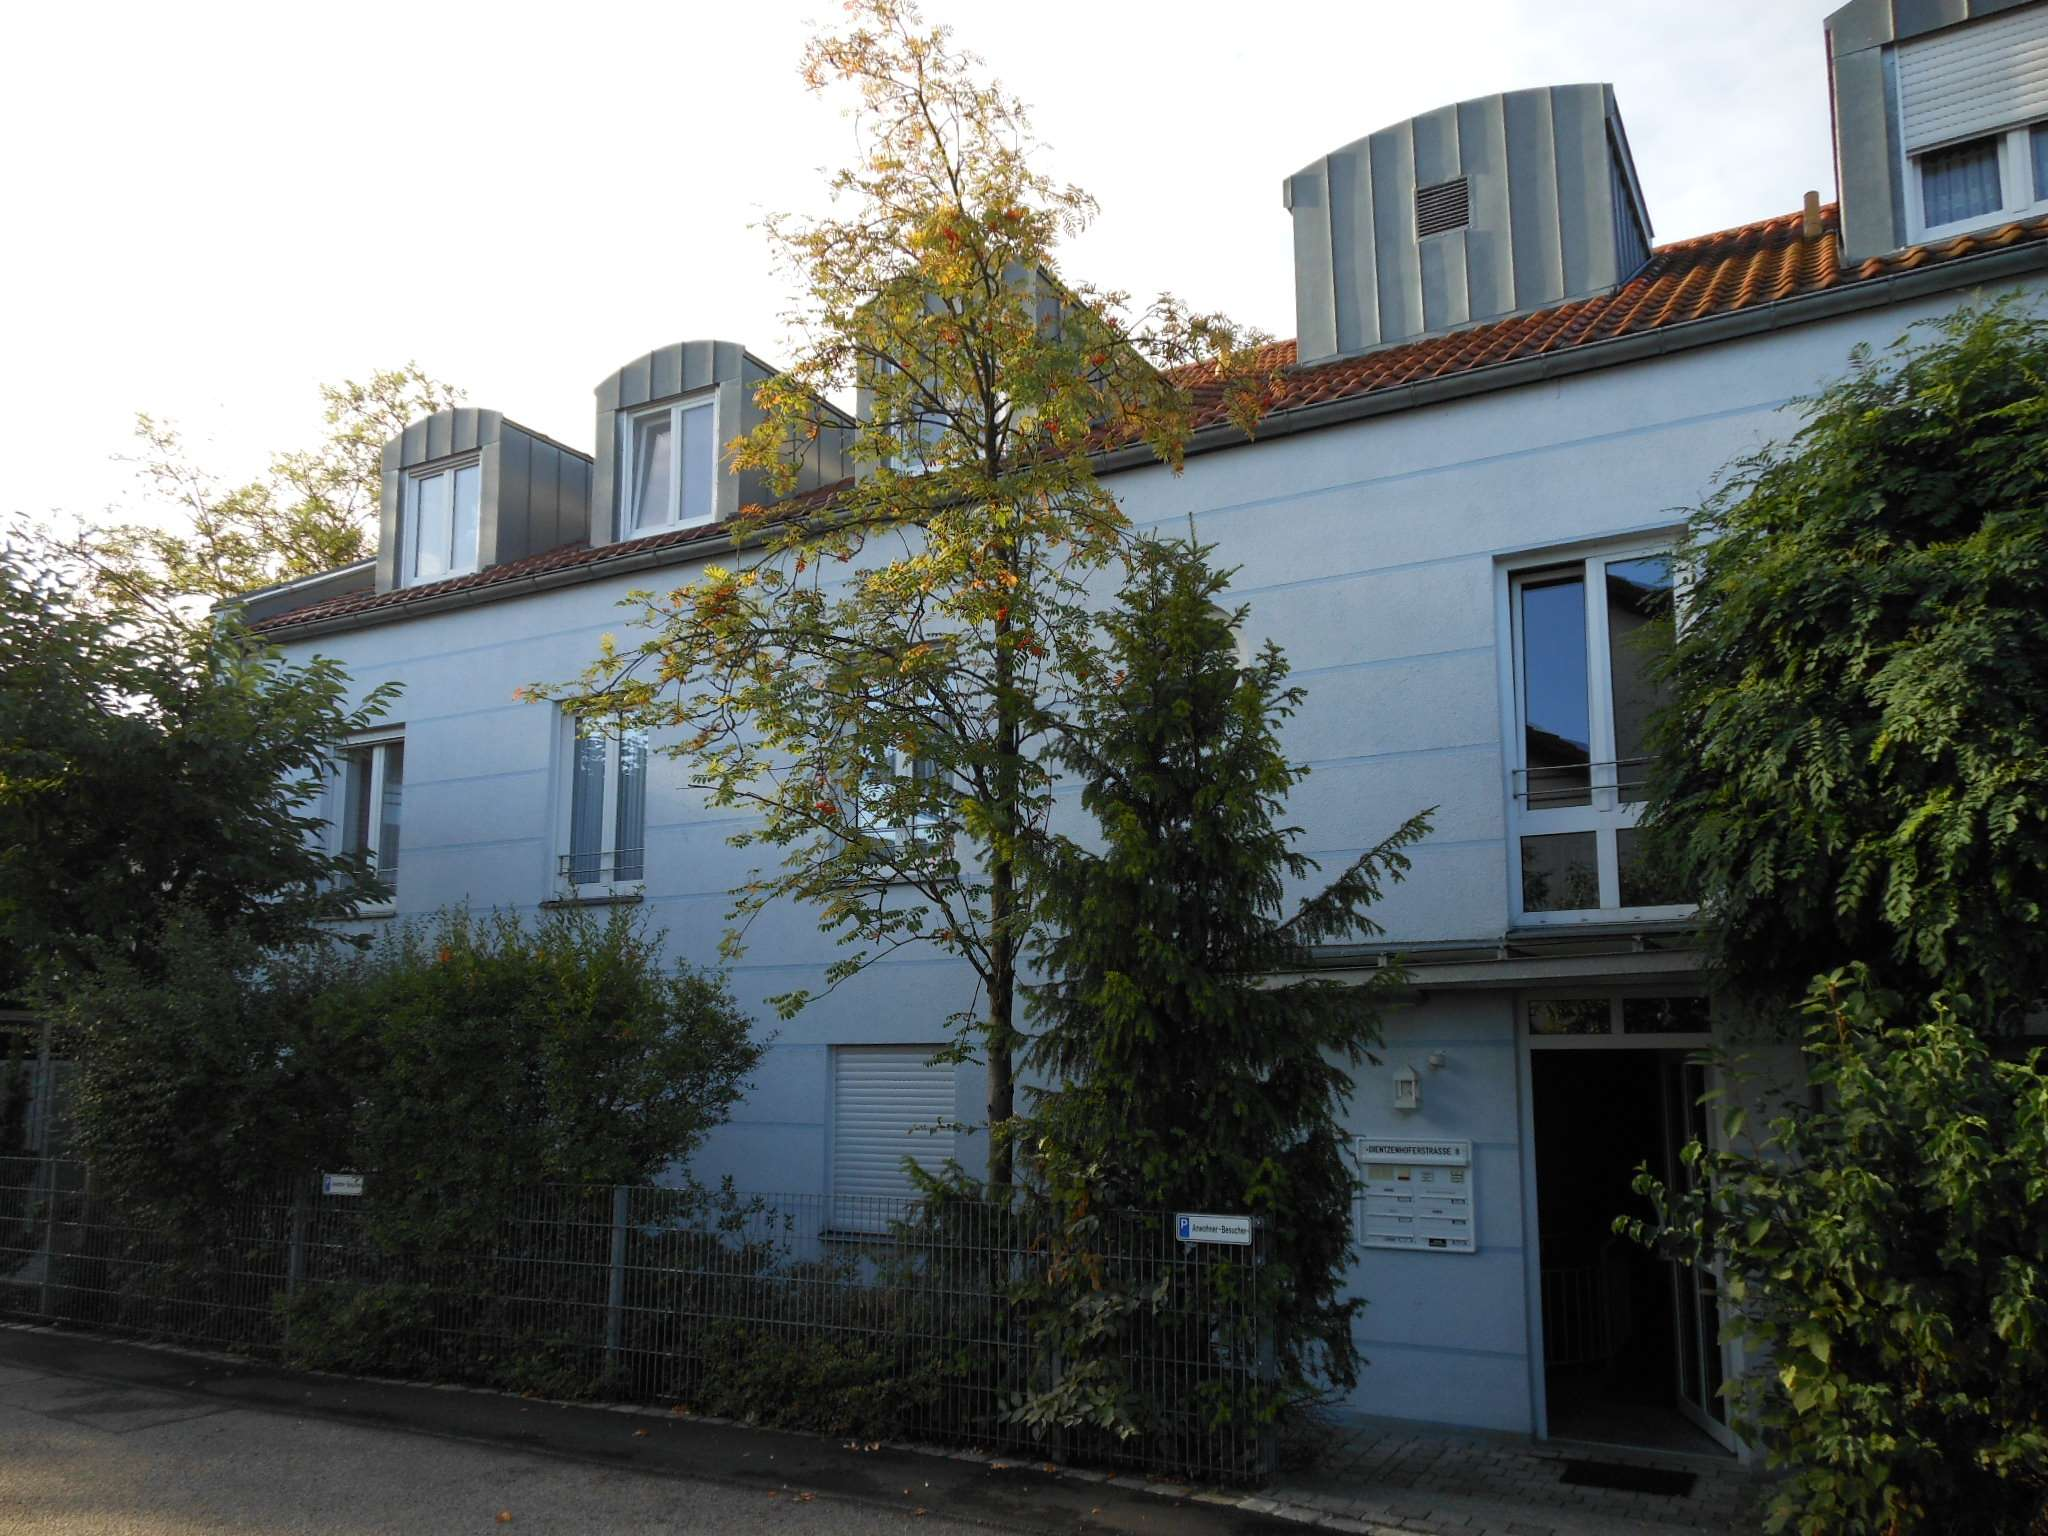 IN Top Lage - Ruhige komfortable DG Wohnung in modernem 6 Fa. Haus